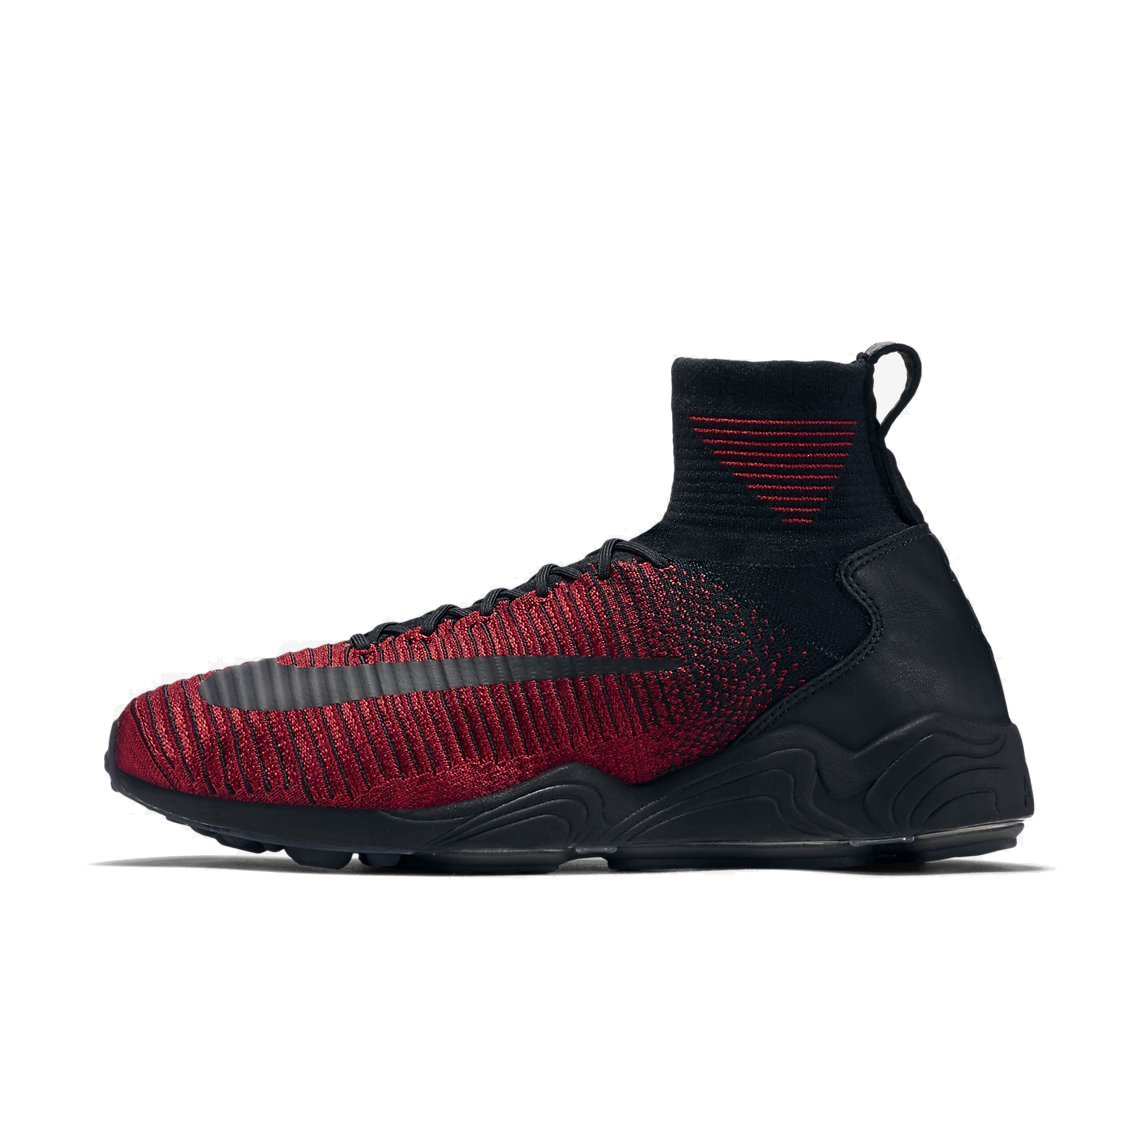 Nike Herren 852616-600 Turnschuhe  40.5 EU|Rot